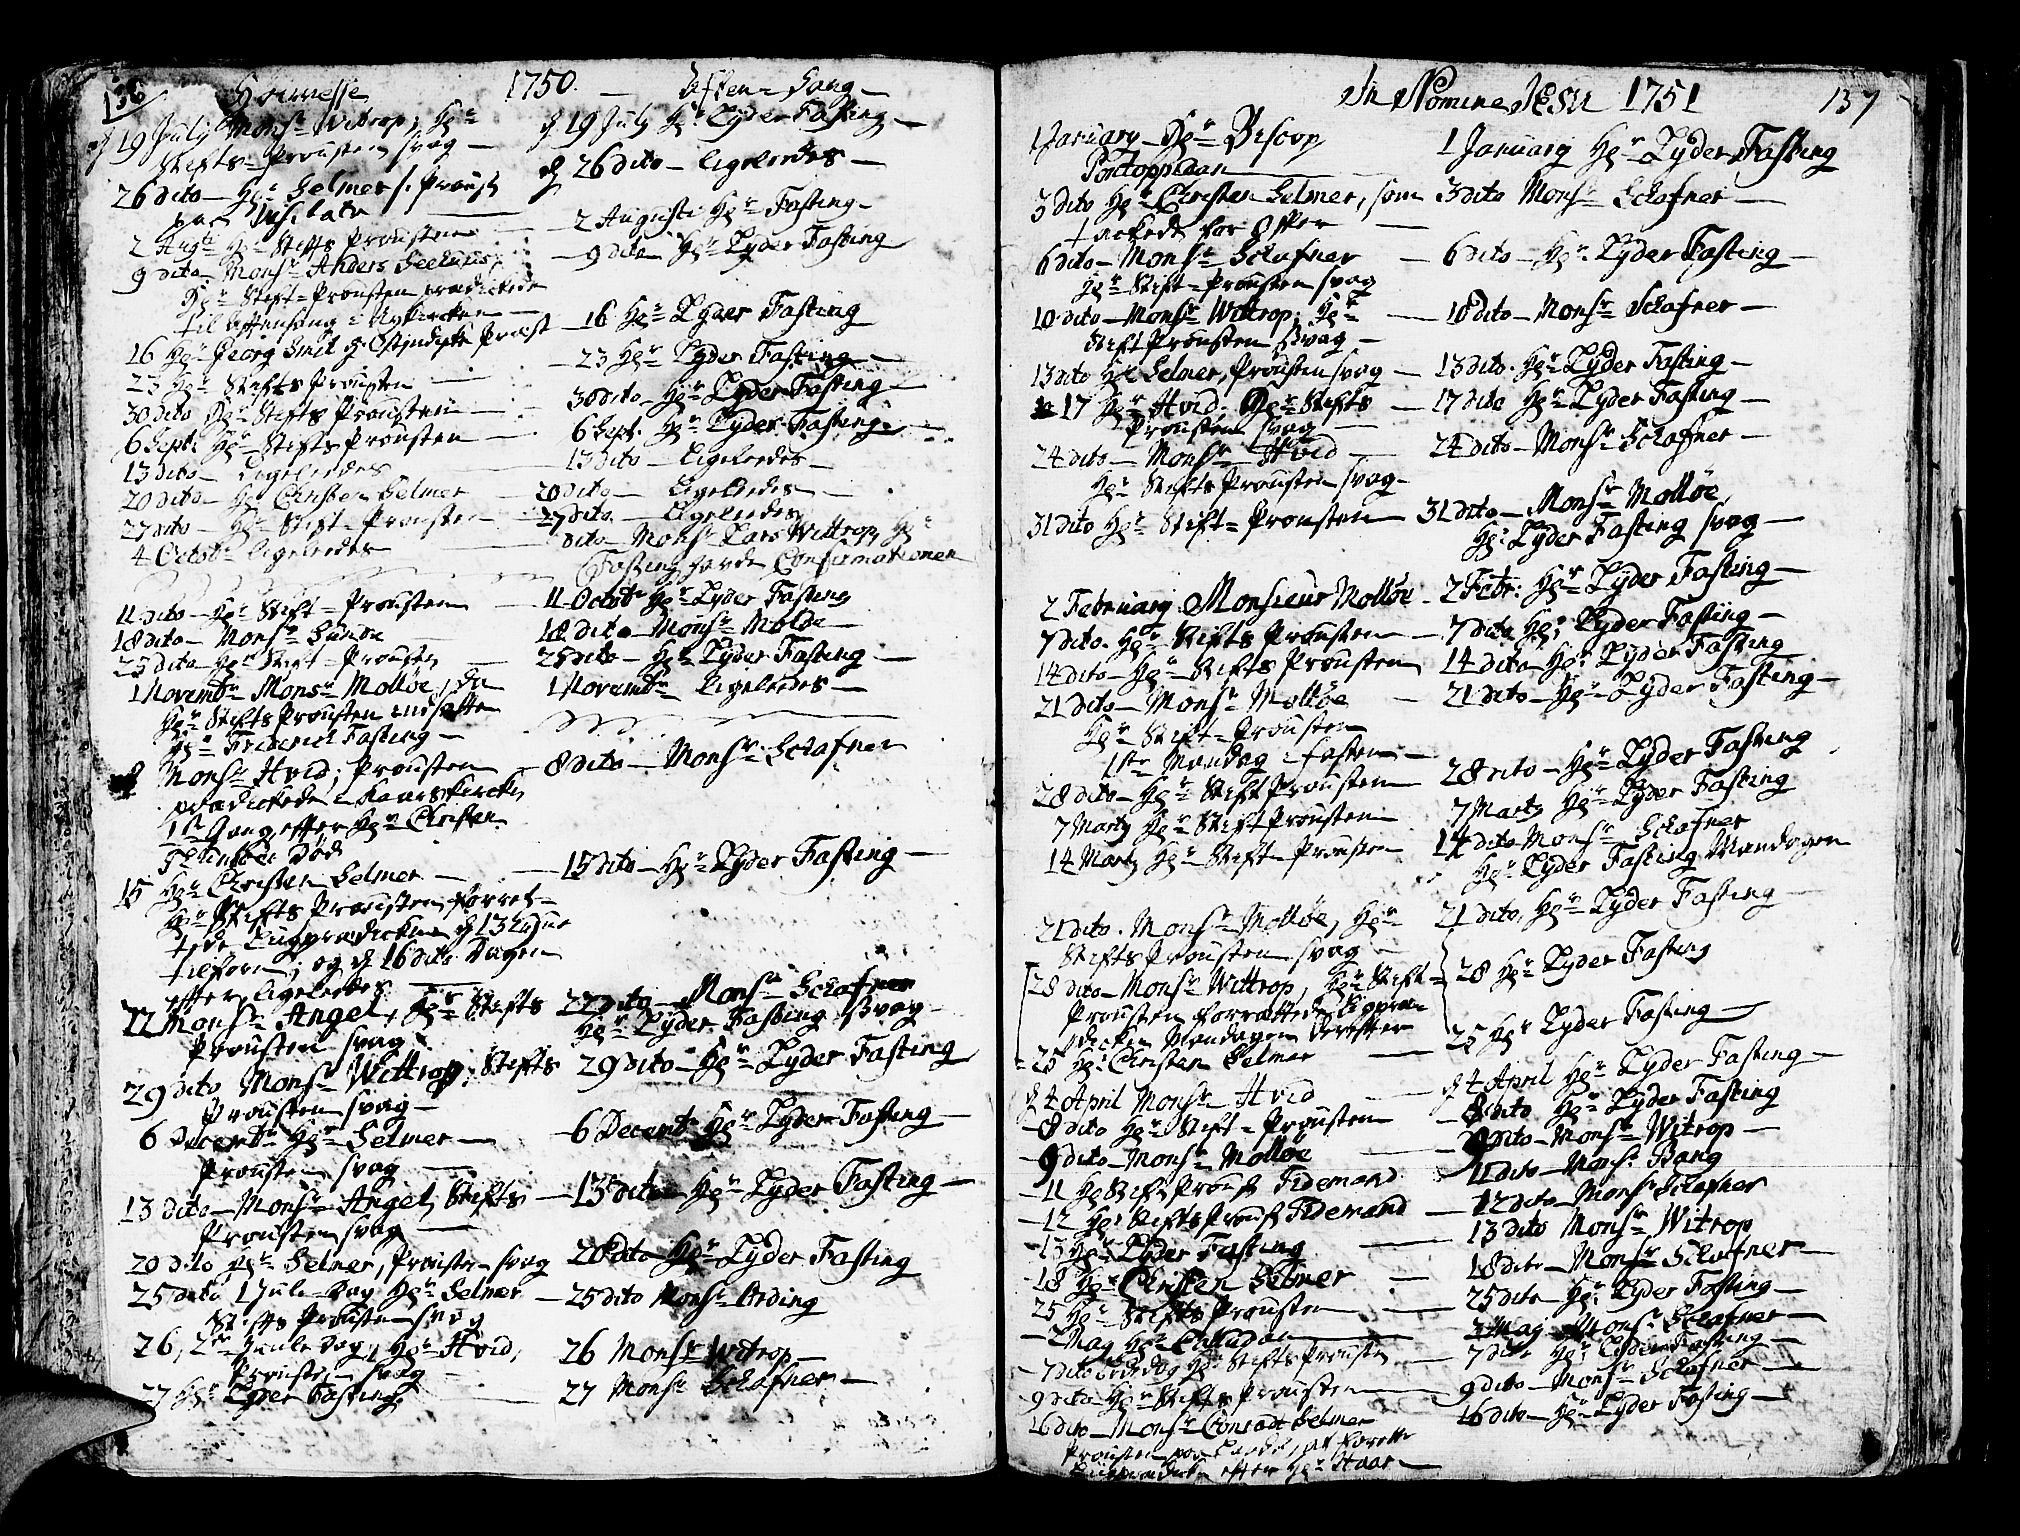 SAB, Domkirken sokneprestembete, H/Haa/L0007: Ministerialbok nr. A 7, 1725-1826, s. 136-137